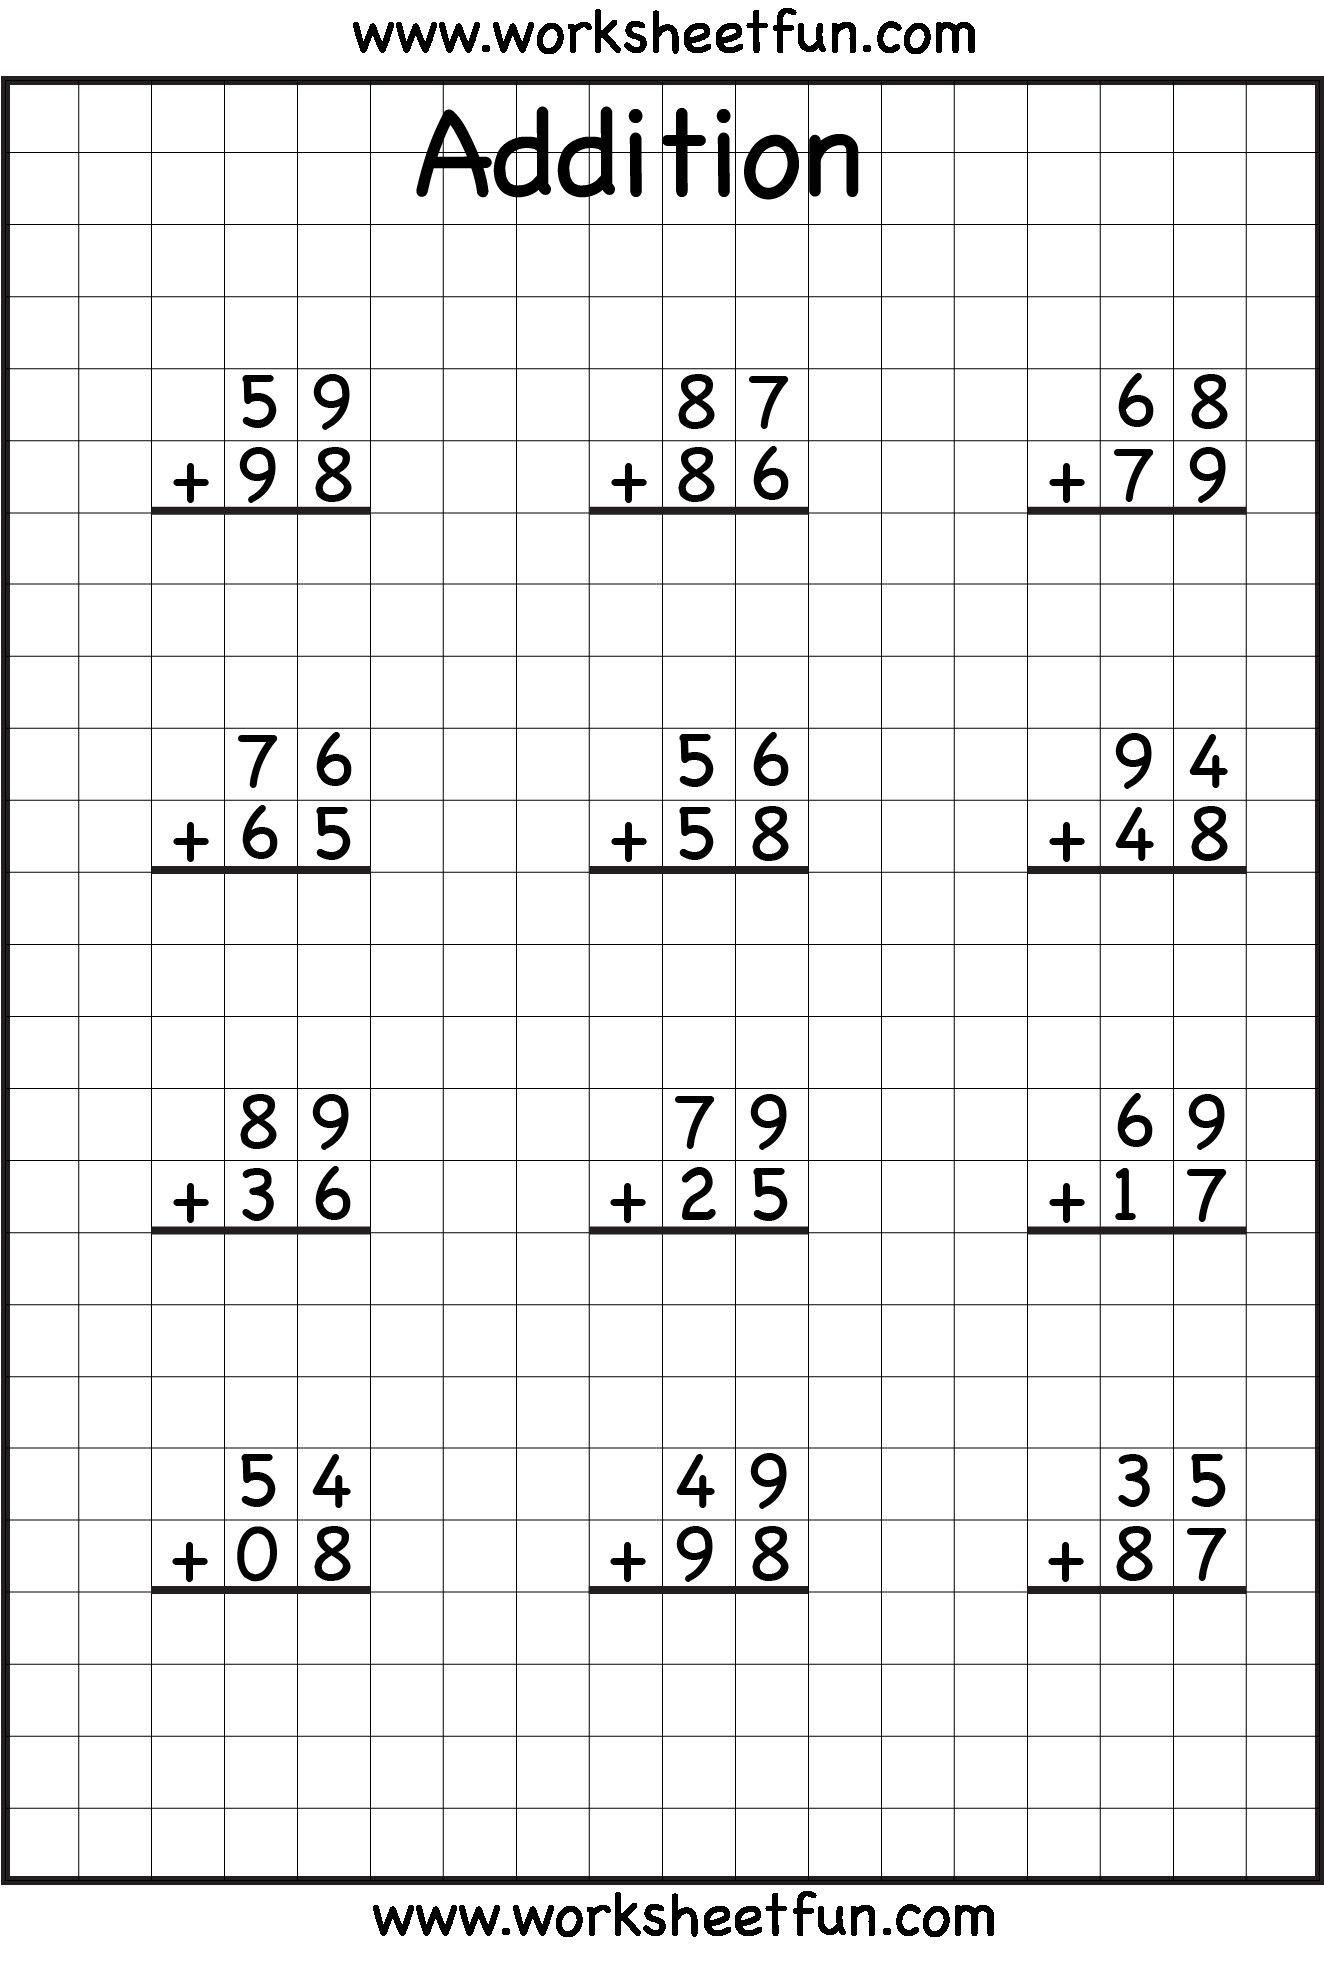 5 Free Math Worksheets Third Grade 3 Addition Add 3 3 Digit Numbers In Columns 25f da0dfe fdb